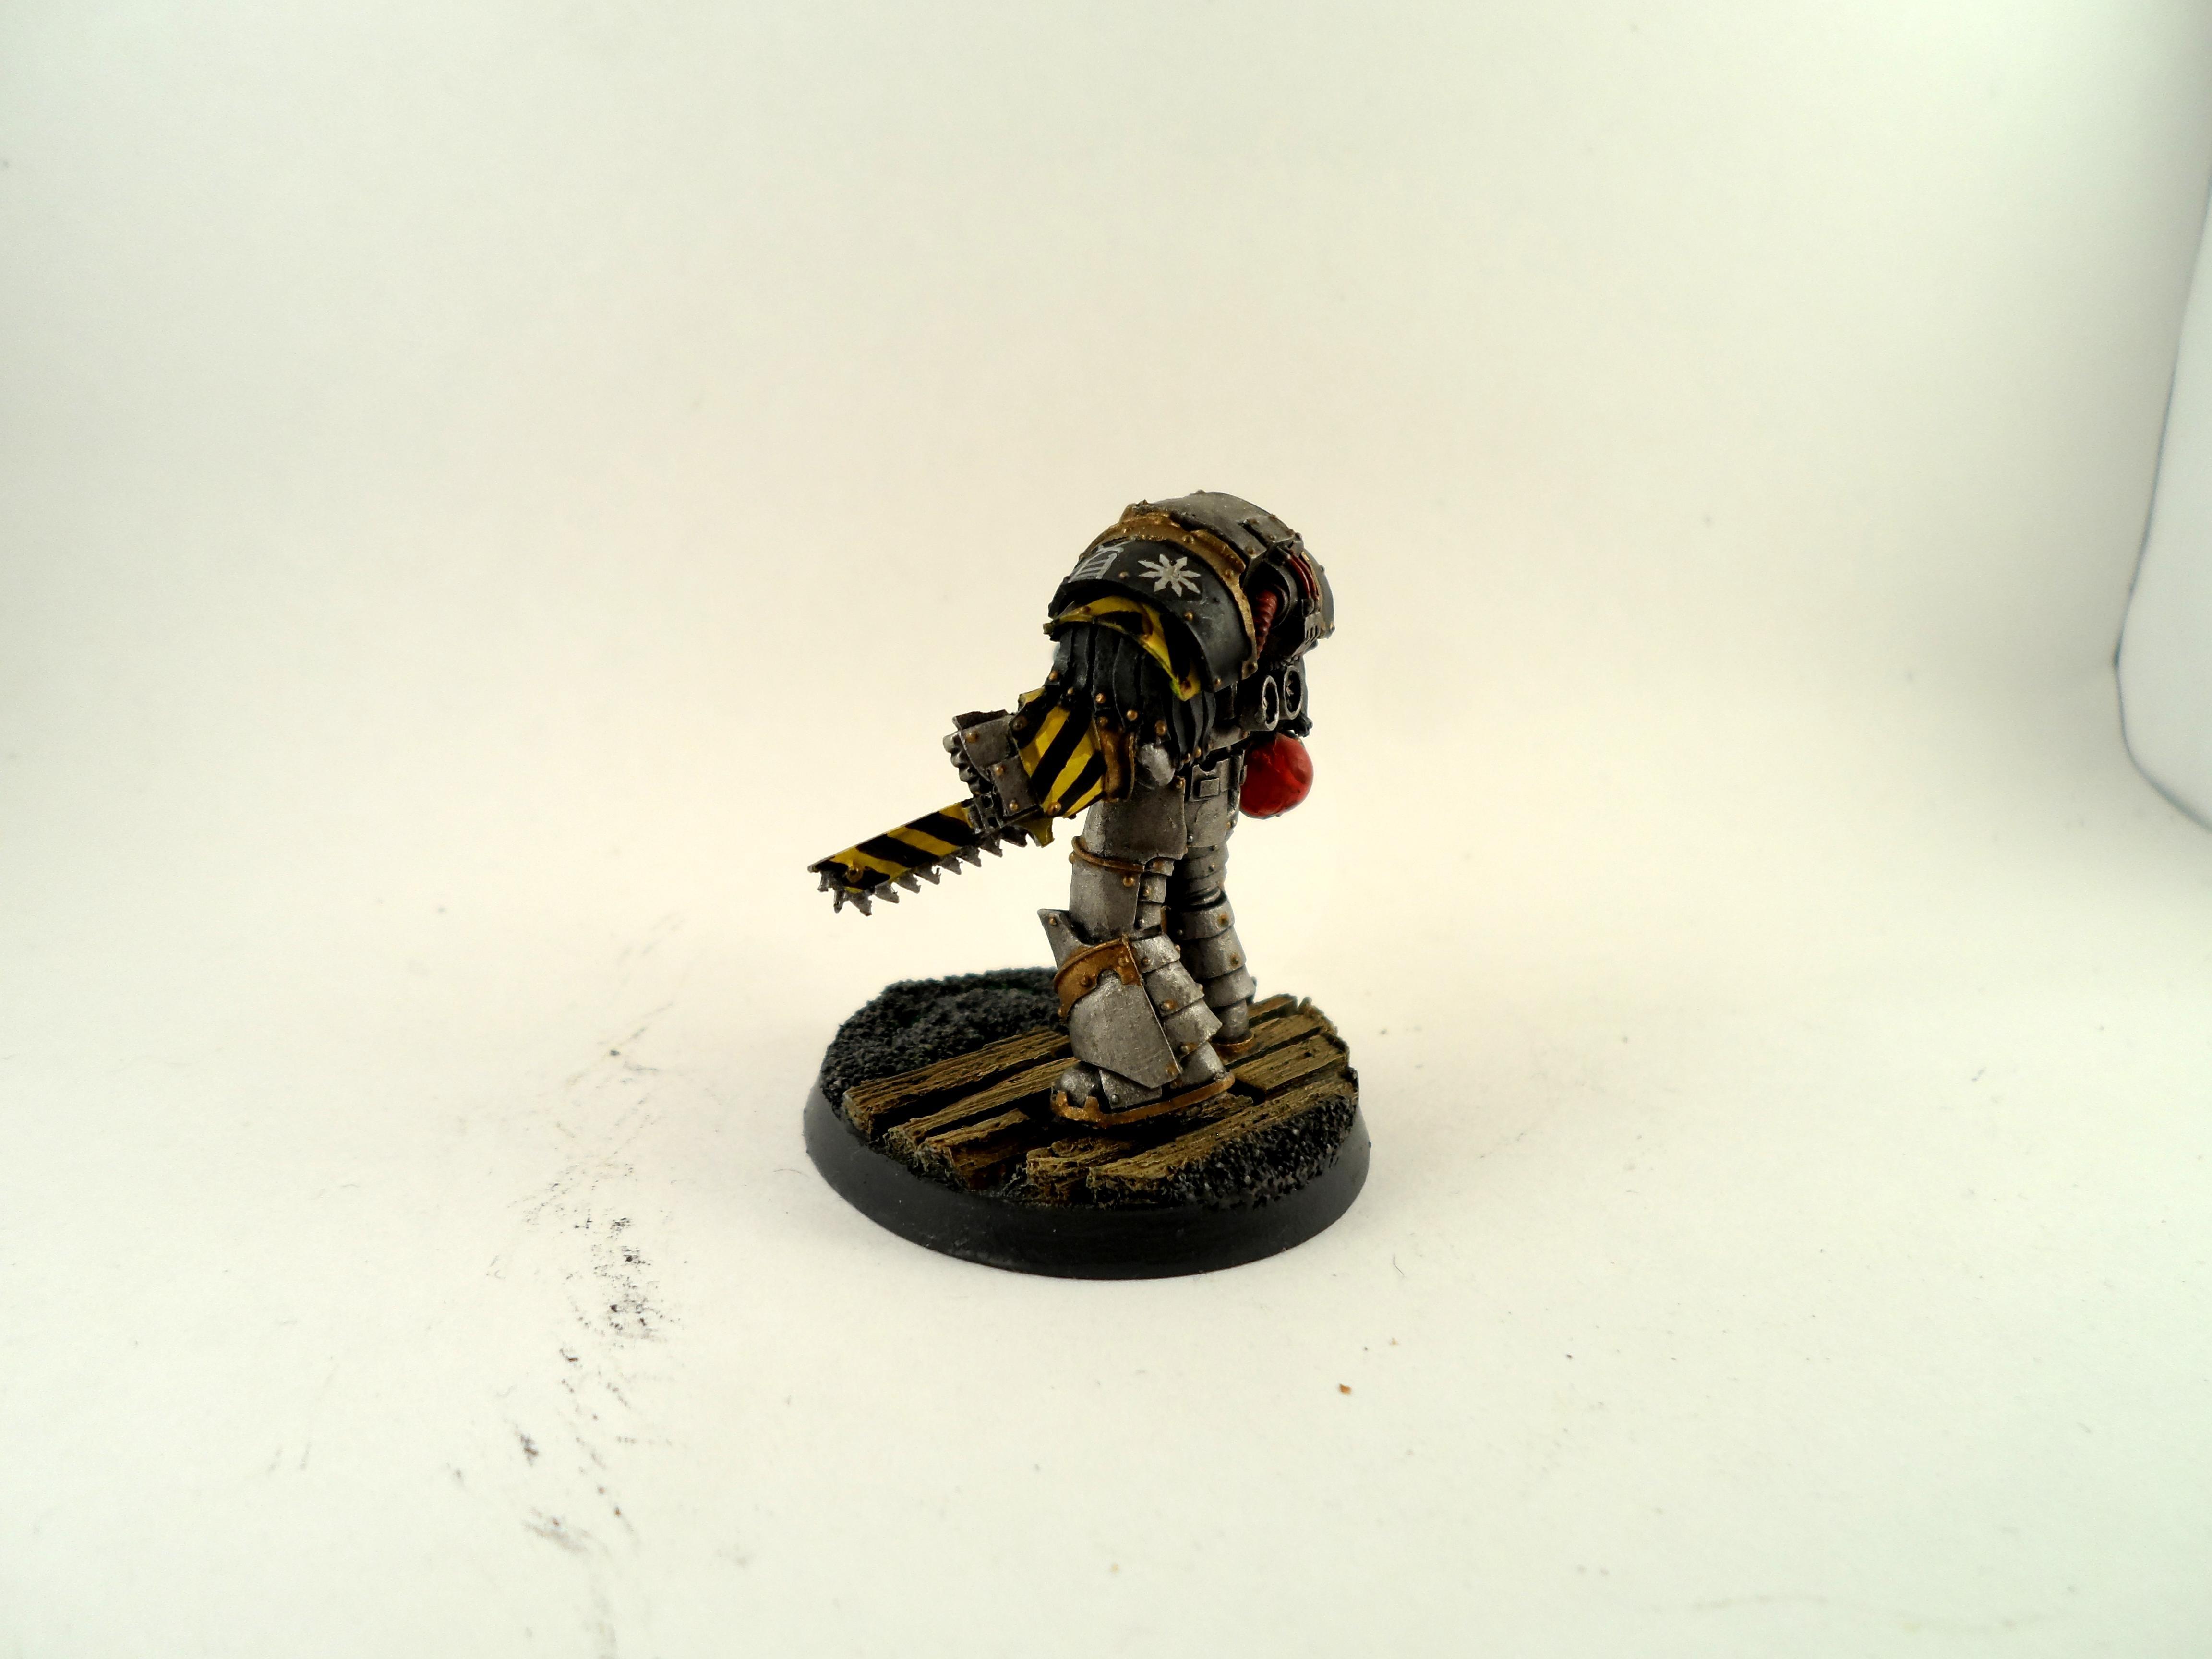 Cataphractii, Chaos, Chaos Space Marines, Iron Warriors, Siege, Terminator Armor